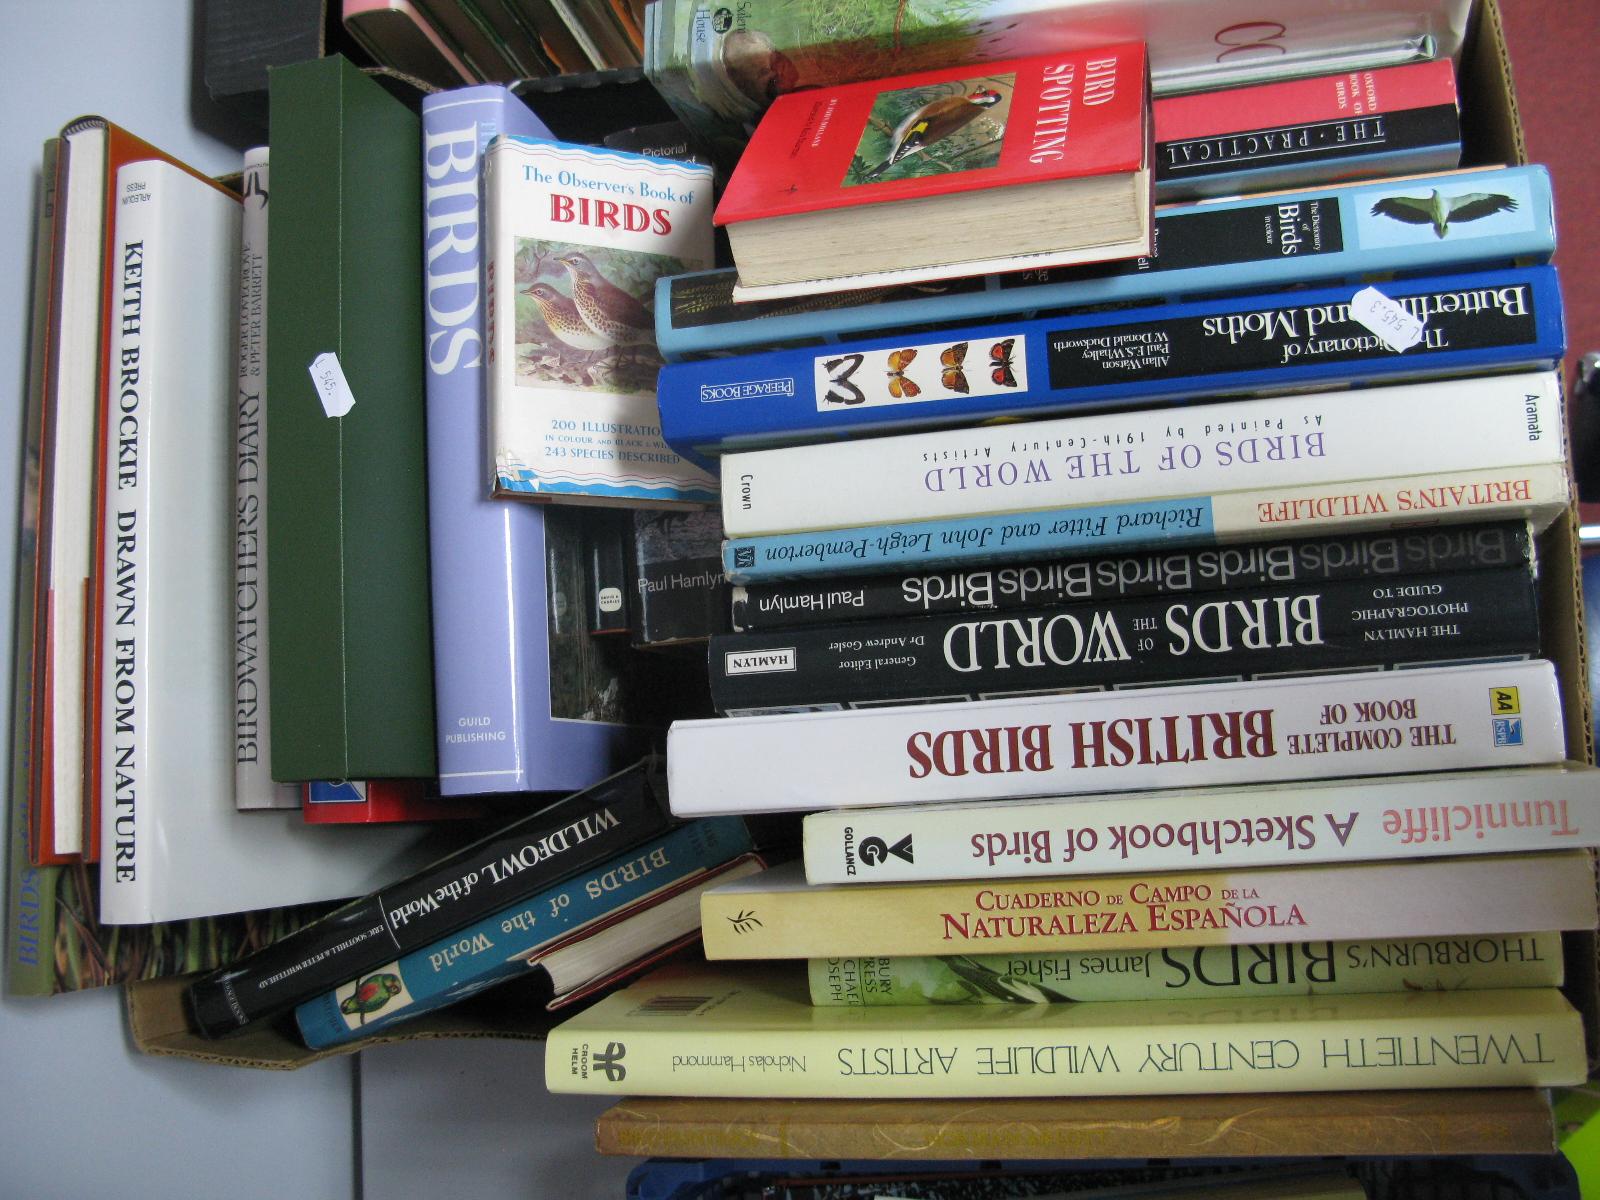 Ornithology and Wildlife Books, sketchbook of birds, Observers guide, Birds of the World, John